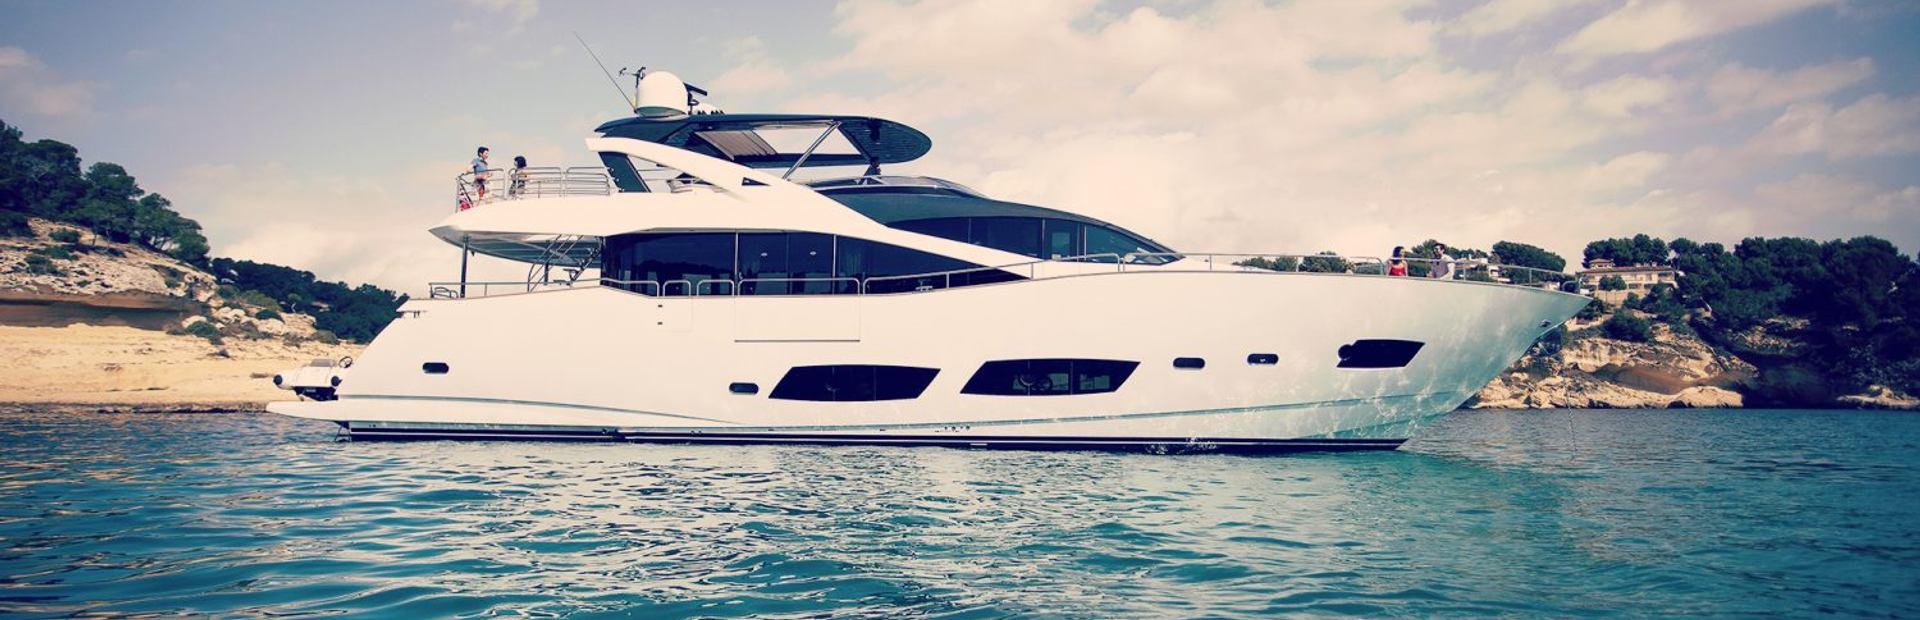 28 Metre Yacht Yacht Charter